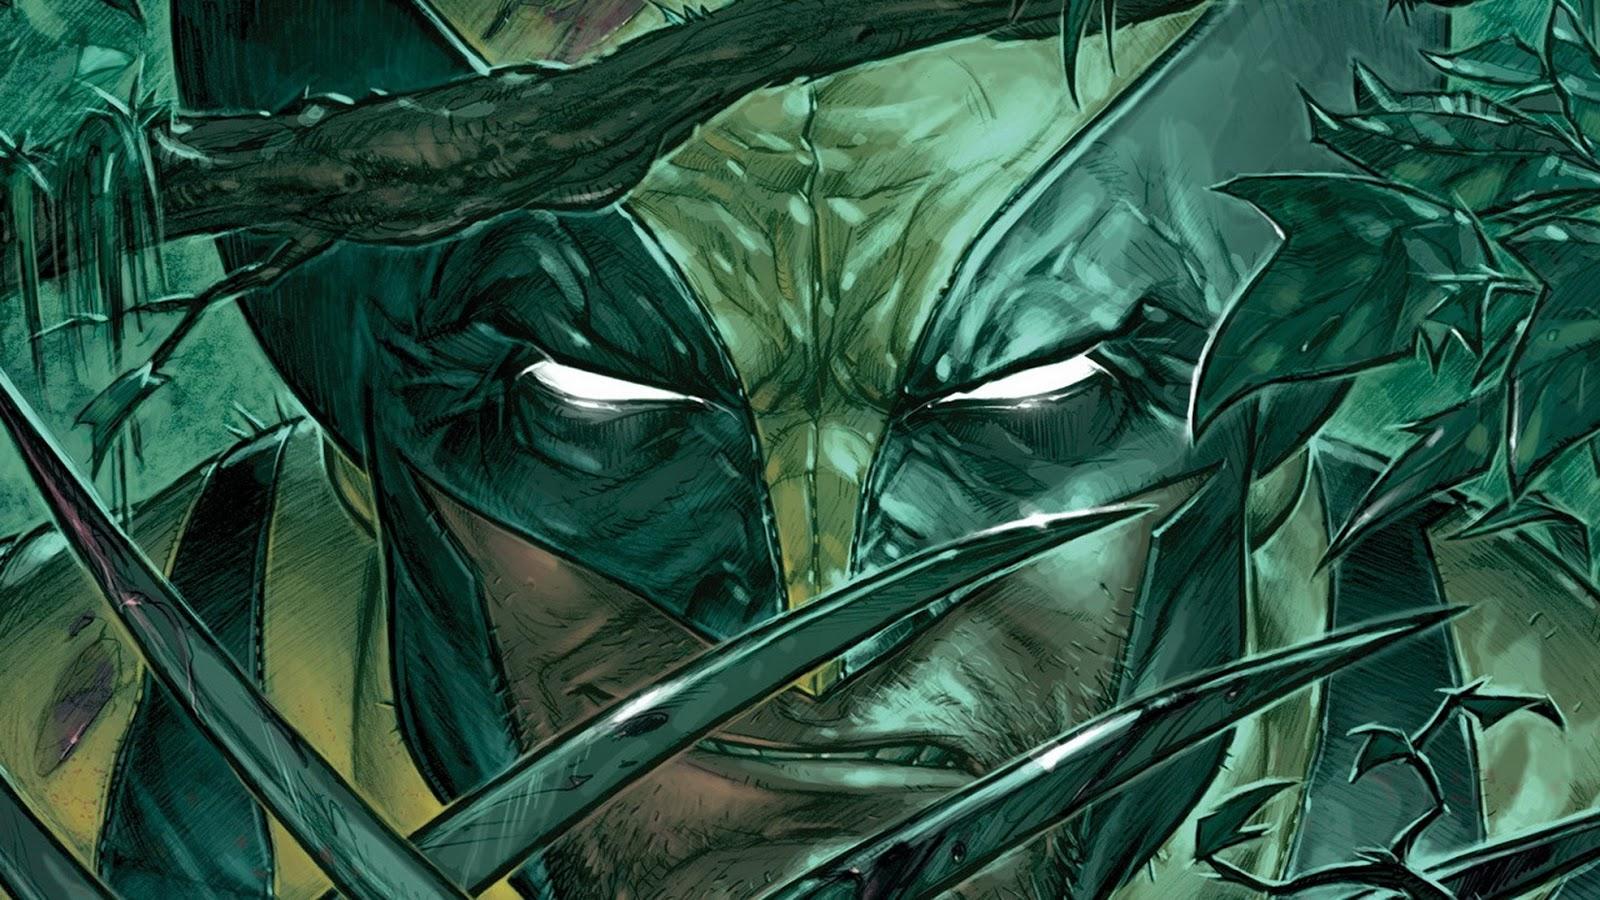 Wolverine X Men Comic Marvel Heroes Superhero HD Wallpaper Desktop PC 1600x900